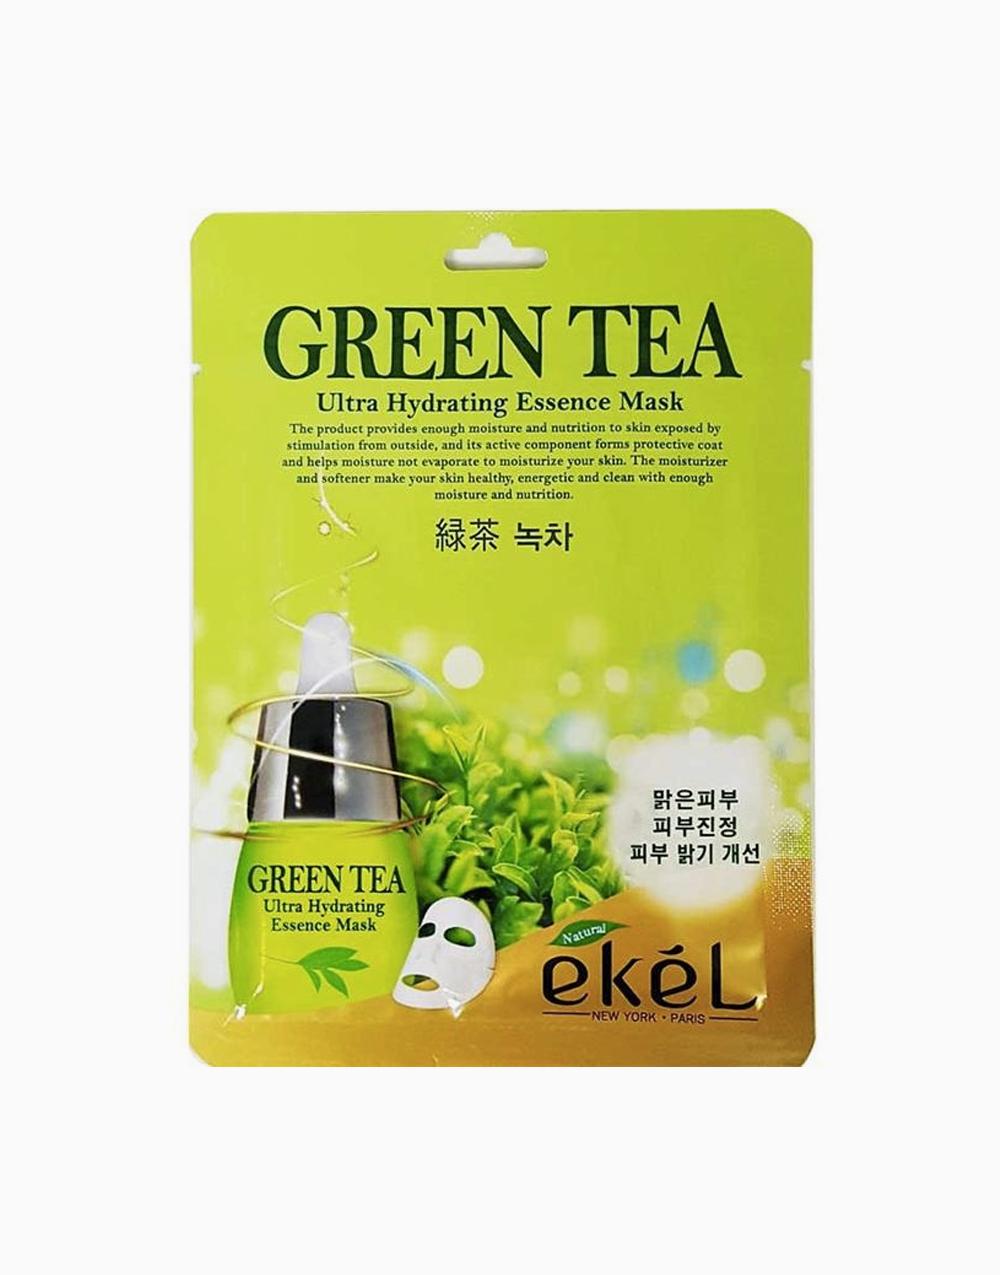 Green Tea Mask by Ekel